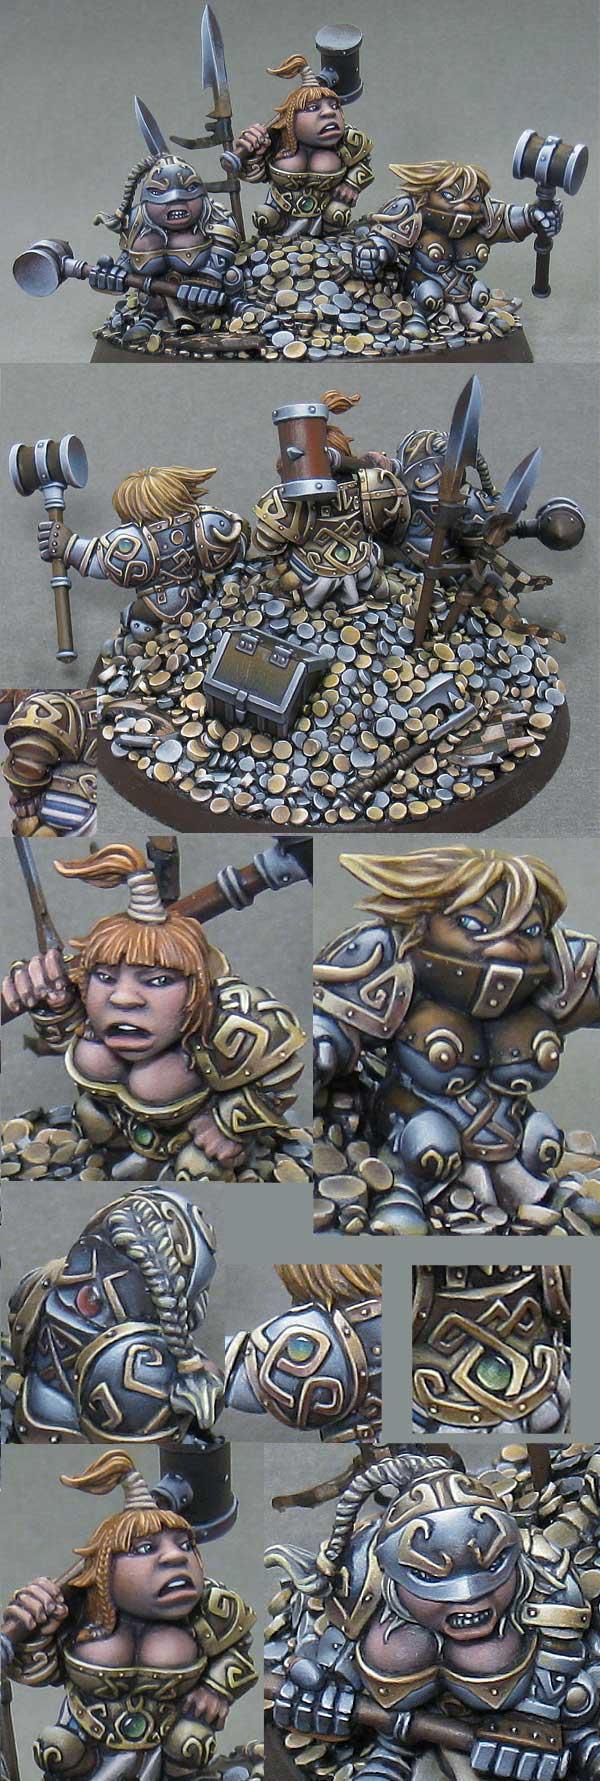 Coins, Dwarves, Female, Girls, Hammer, Non-Metallic Metal, Rackham, Shiny, Treasures, Trophies, Warhammer Fantasy